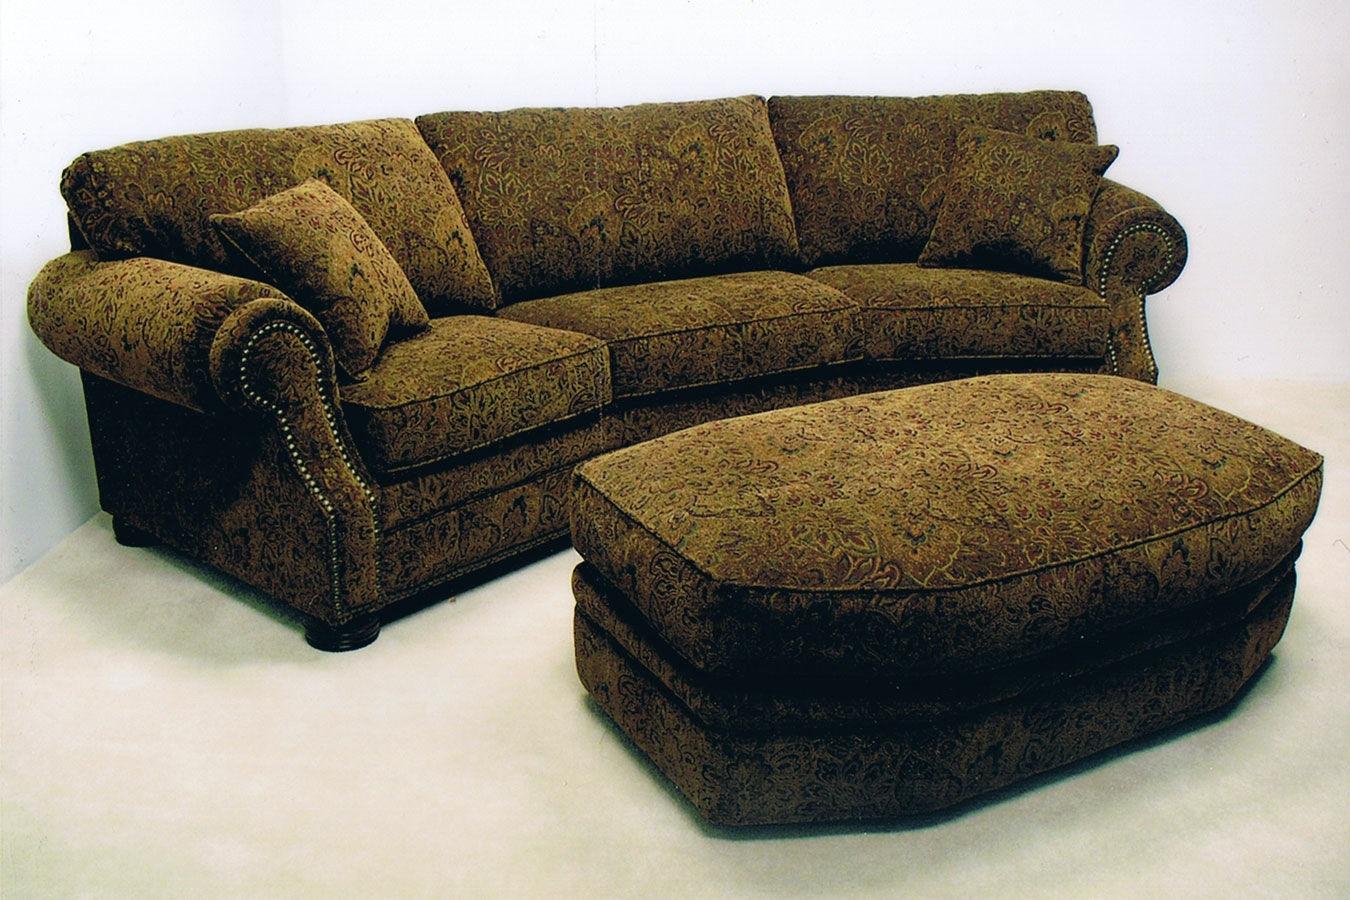 LaCrosse Living Room 120u0027u0027 Two Piece Conversation Sofa